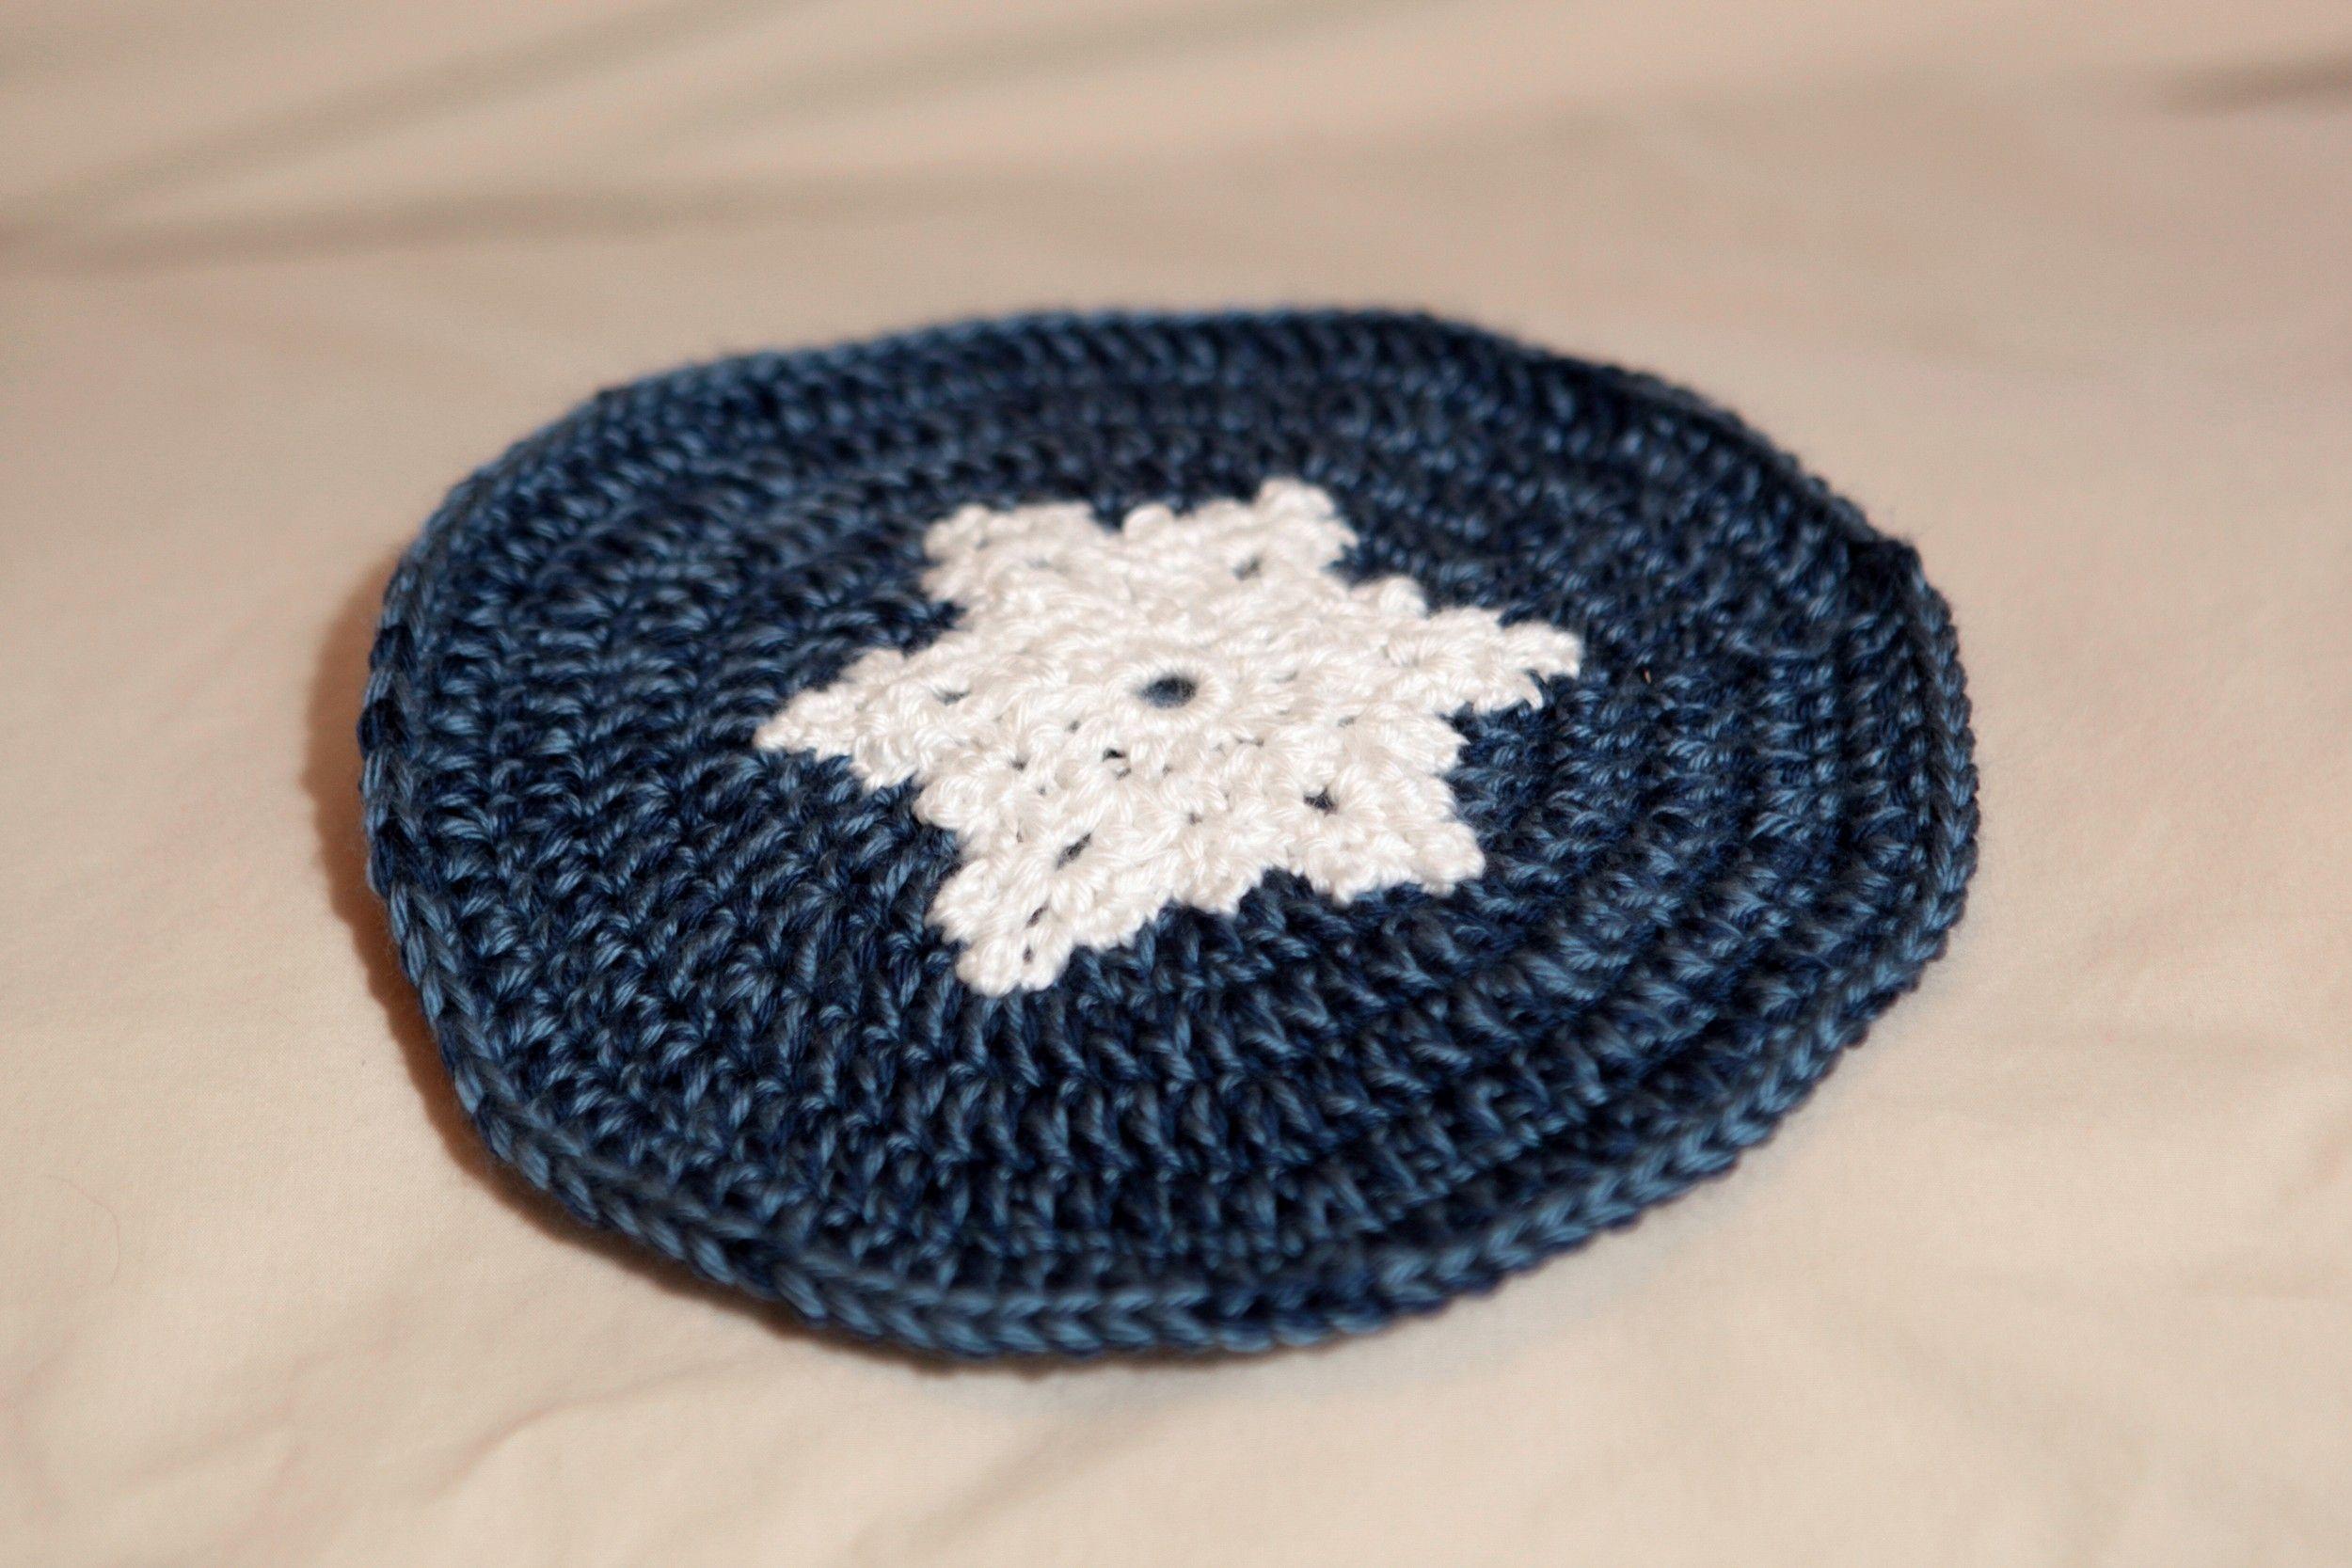 Free Crochet Snowflake Potholder Pattern : Snowflake Pot Holder - Crochet My Creations Pinterest